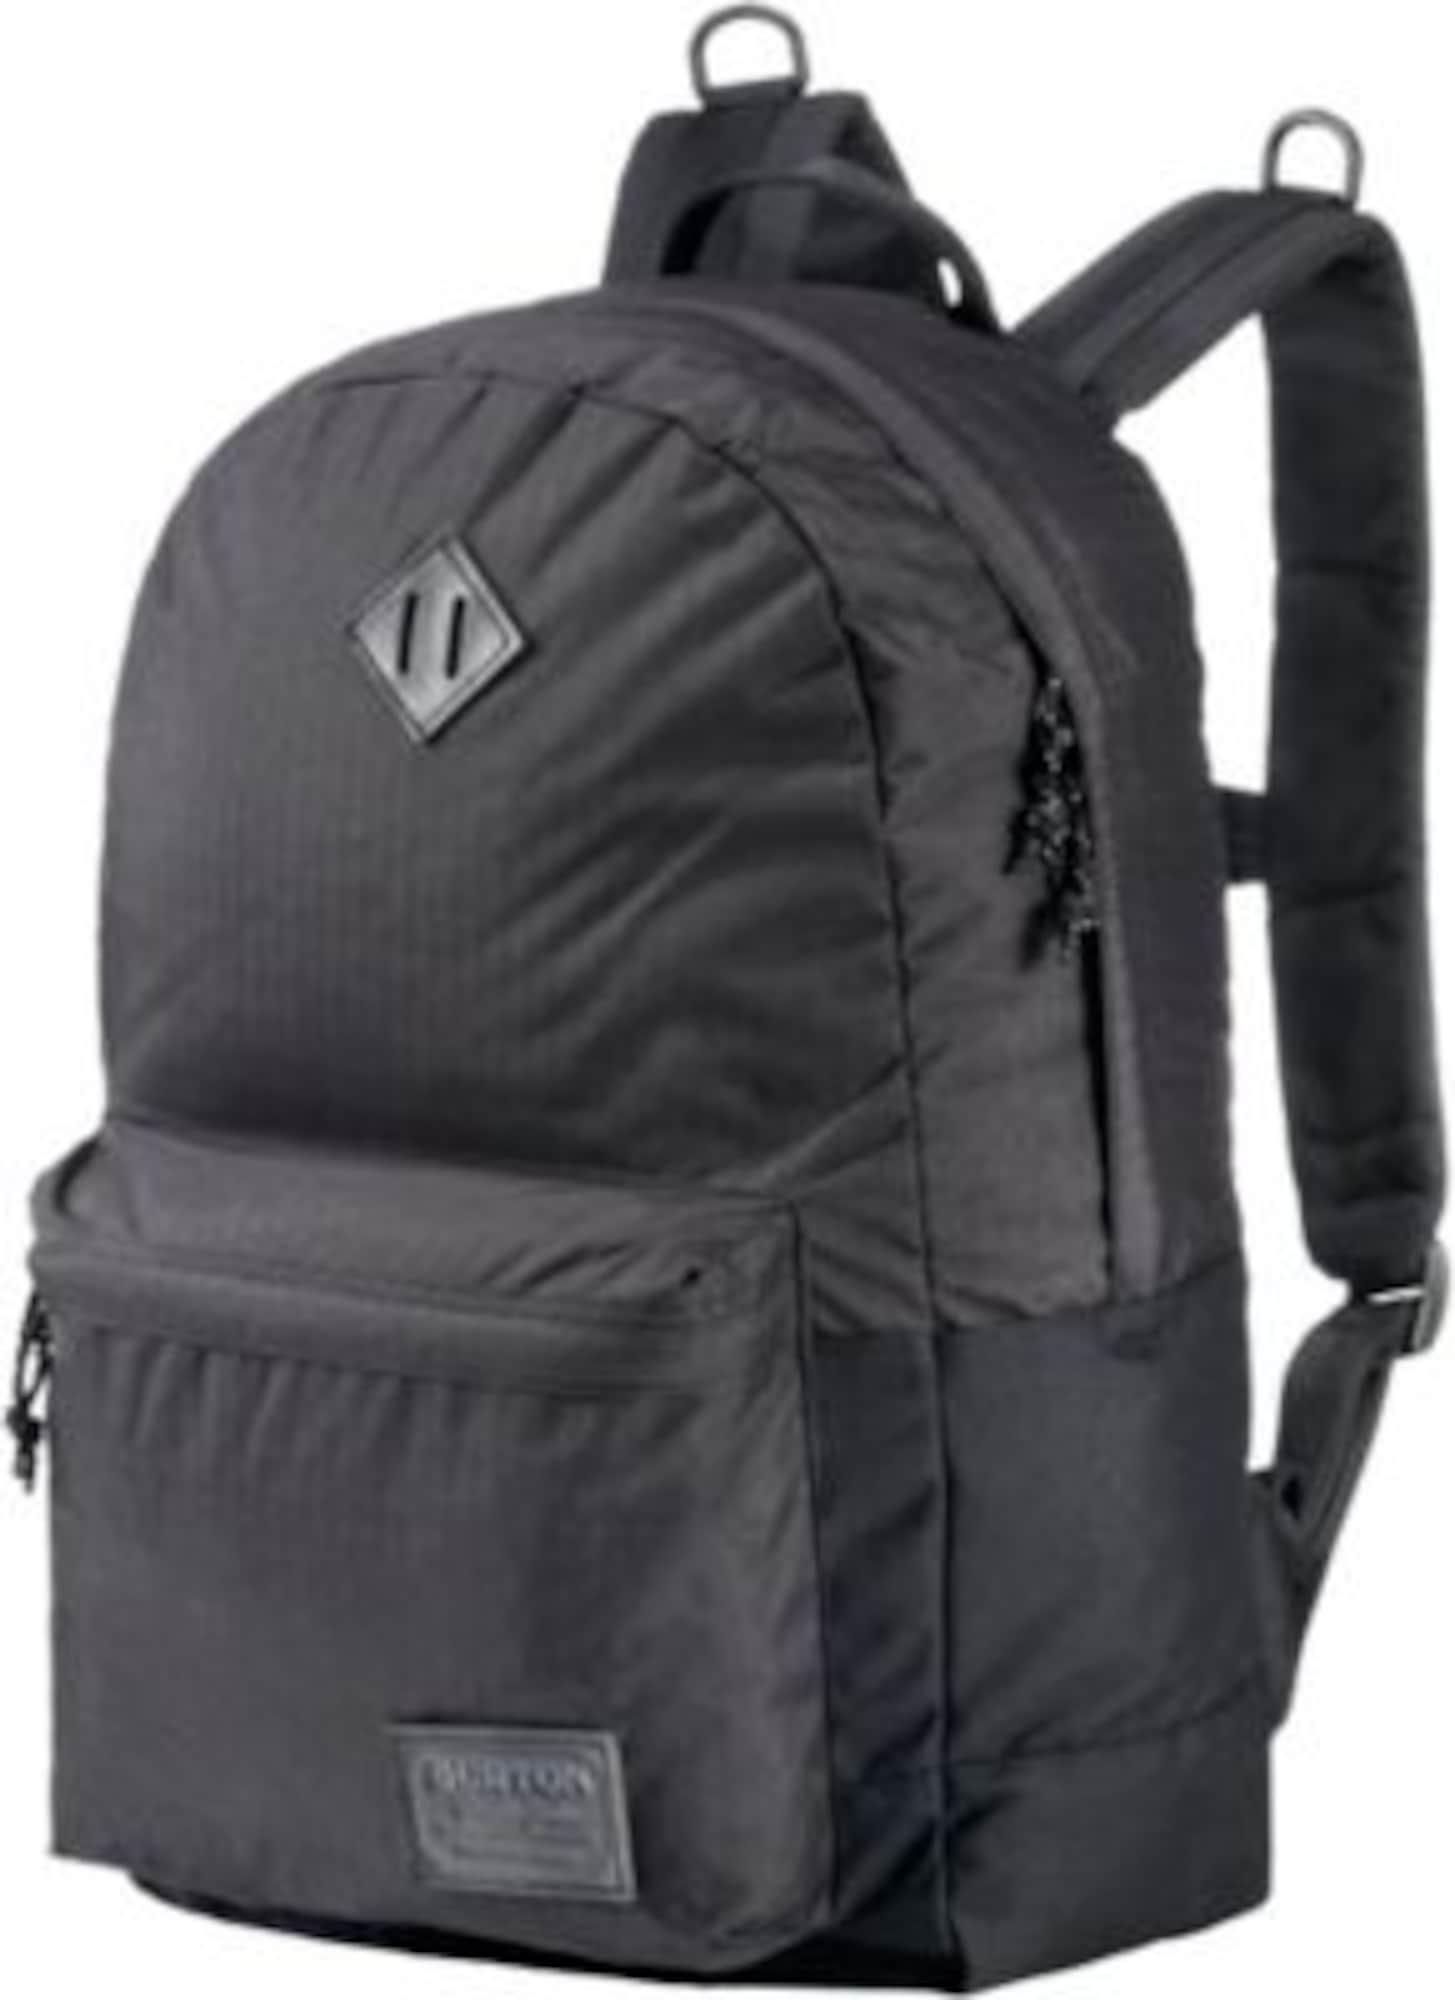 Daypack   Taschen > Rucksäcke > Tagesrucksäcke   Burton